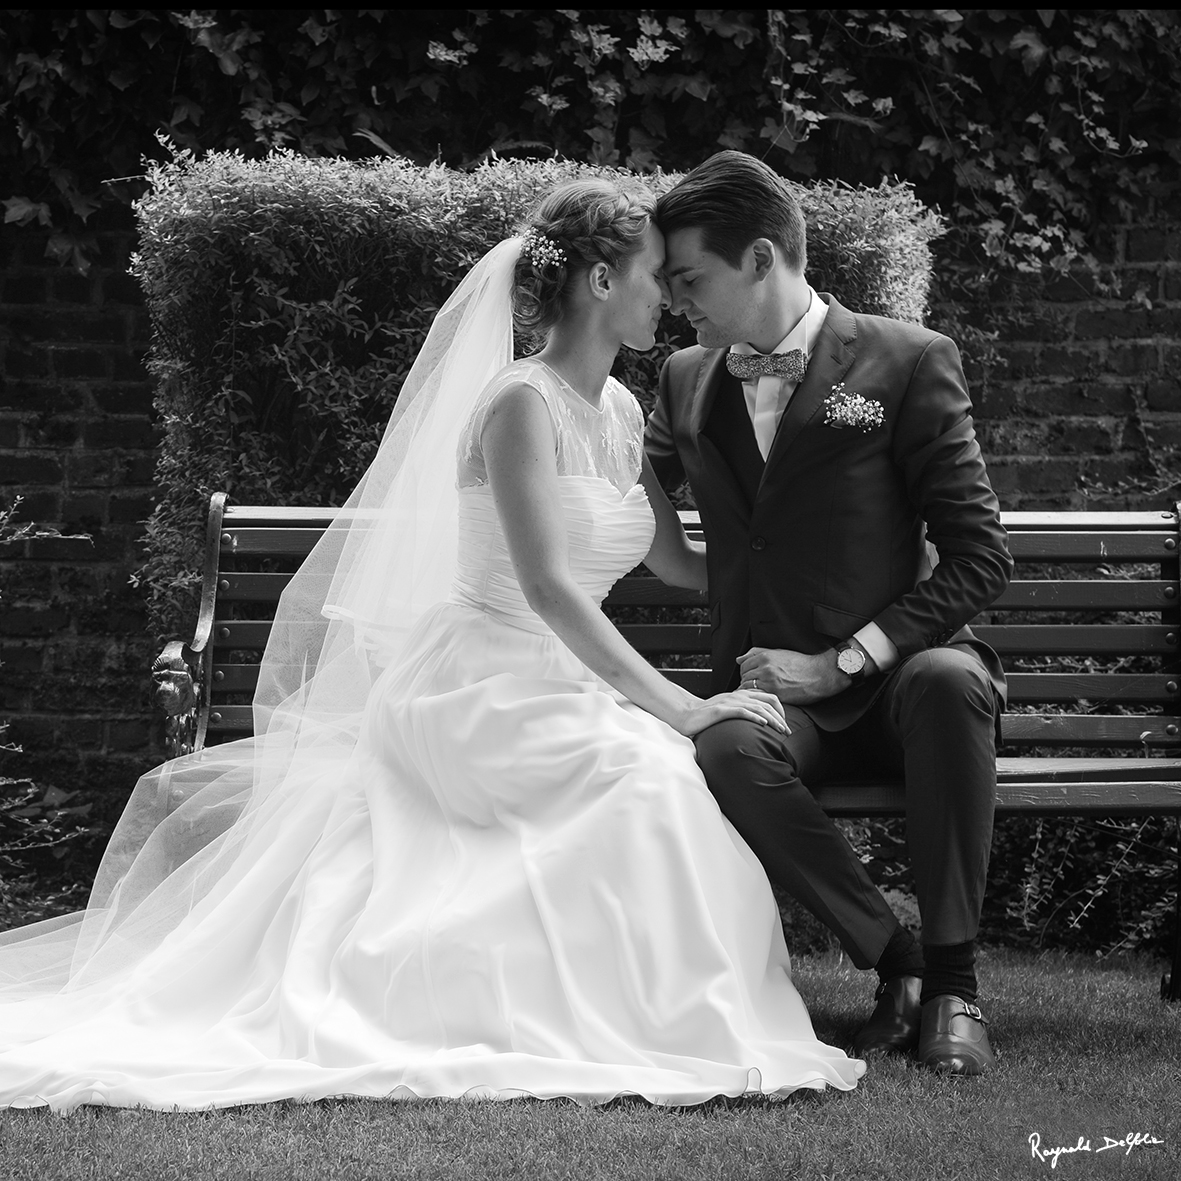 Mariage par Raynald Delfolie